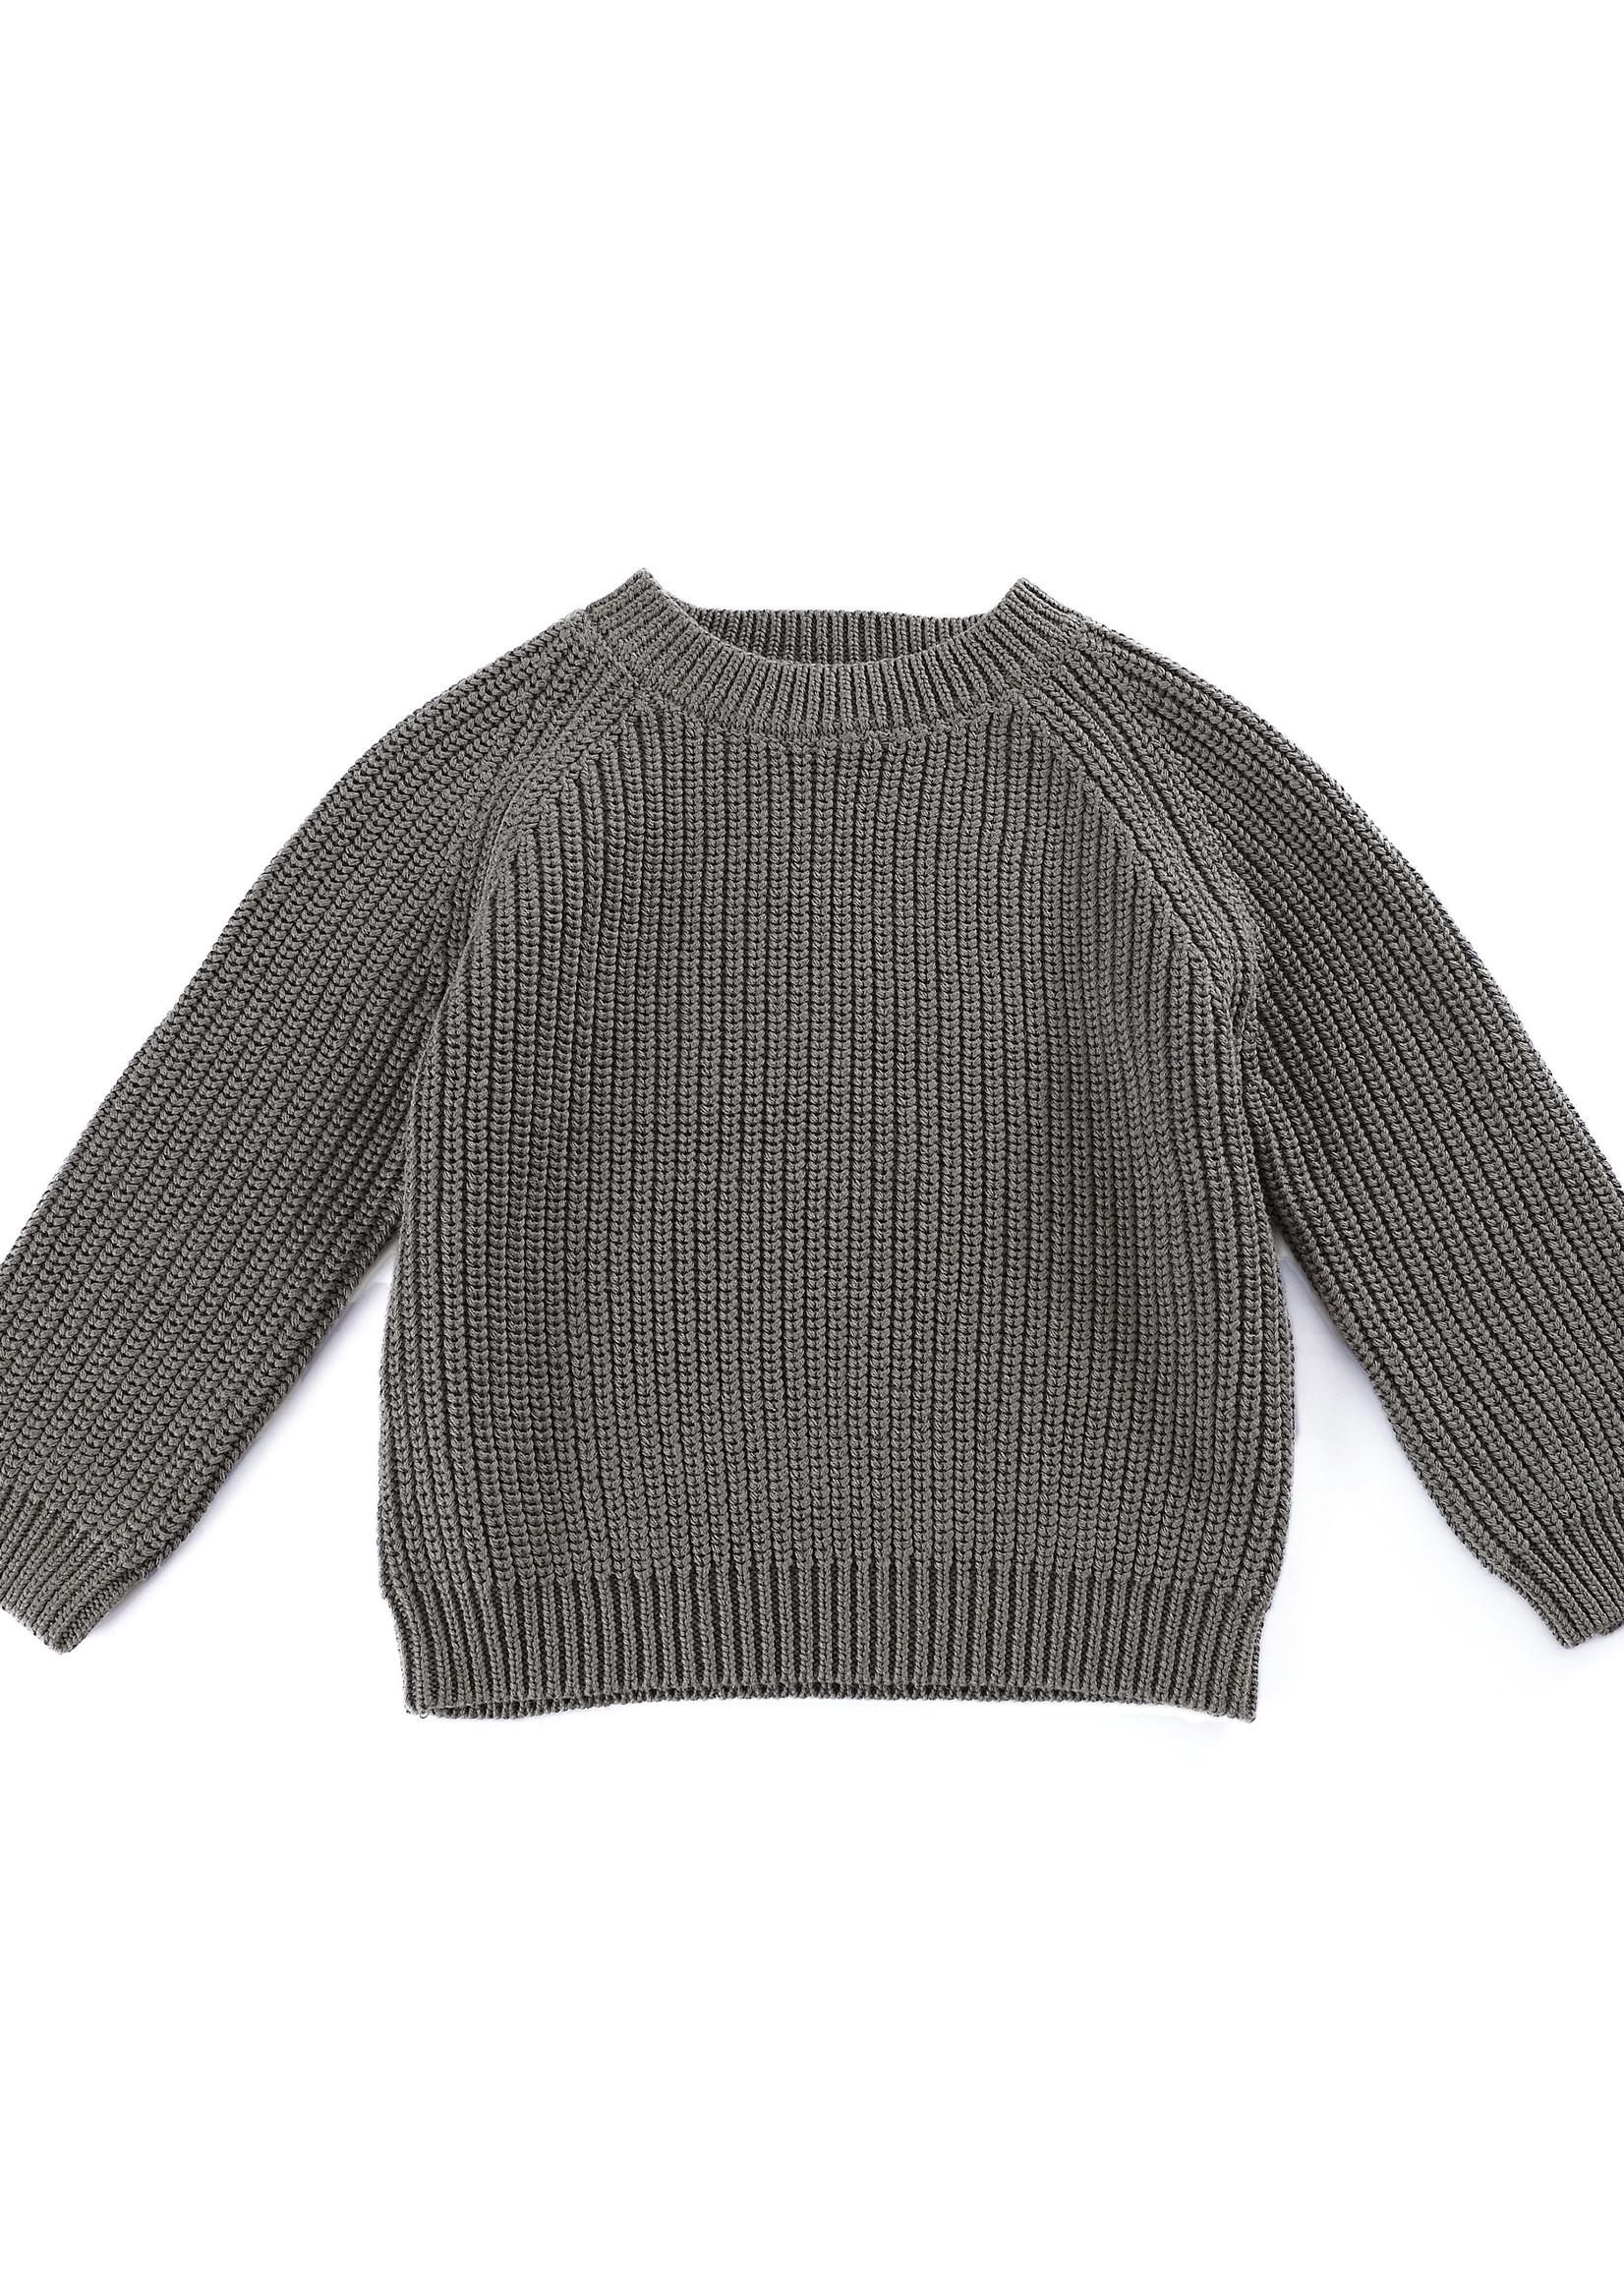 Donsje Amsterdam Jade Sweater - Silver Sage